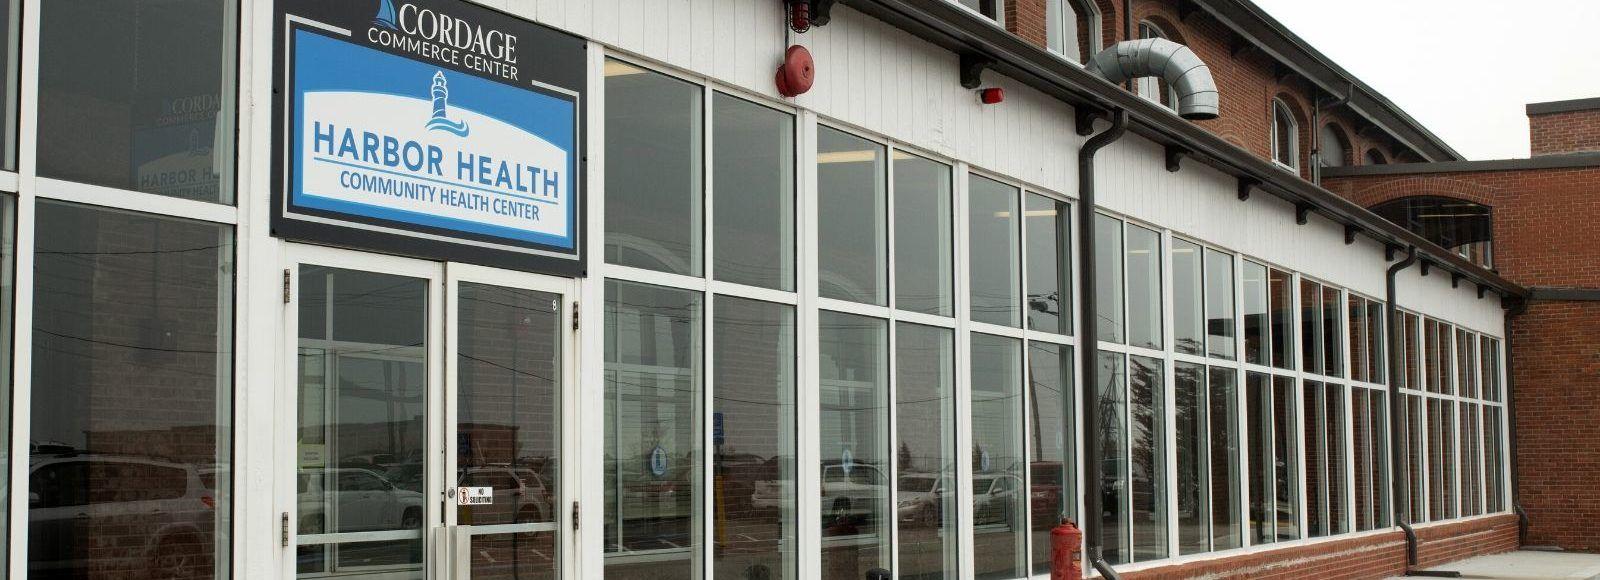 Harbor Community Health Center - Plymouth